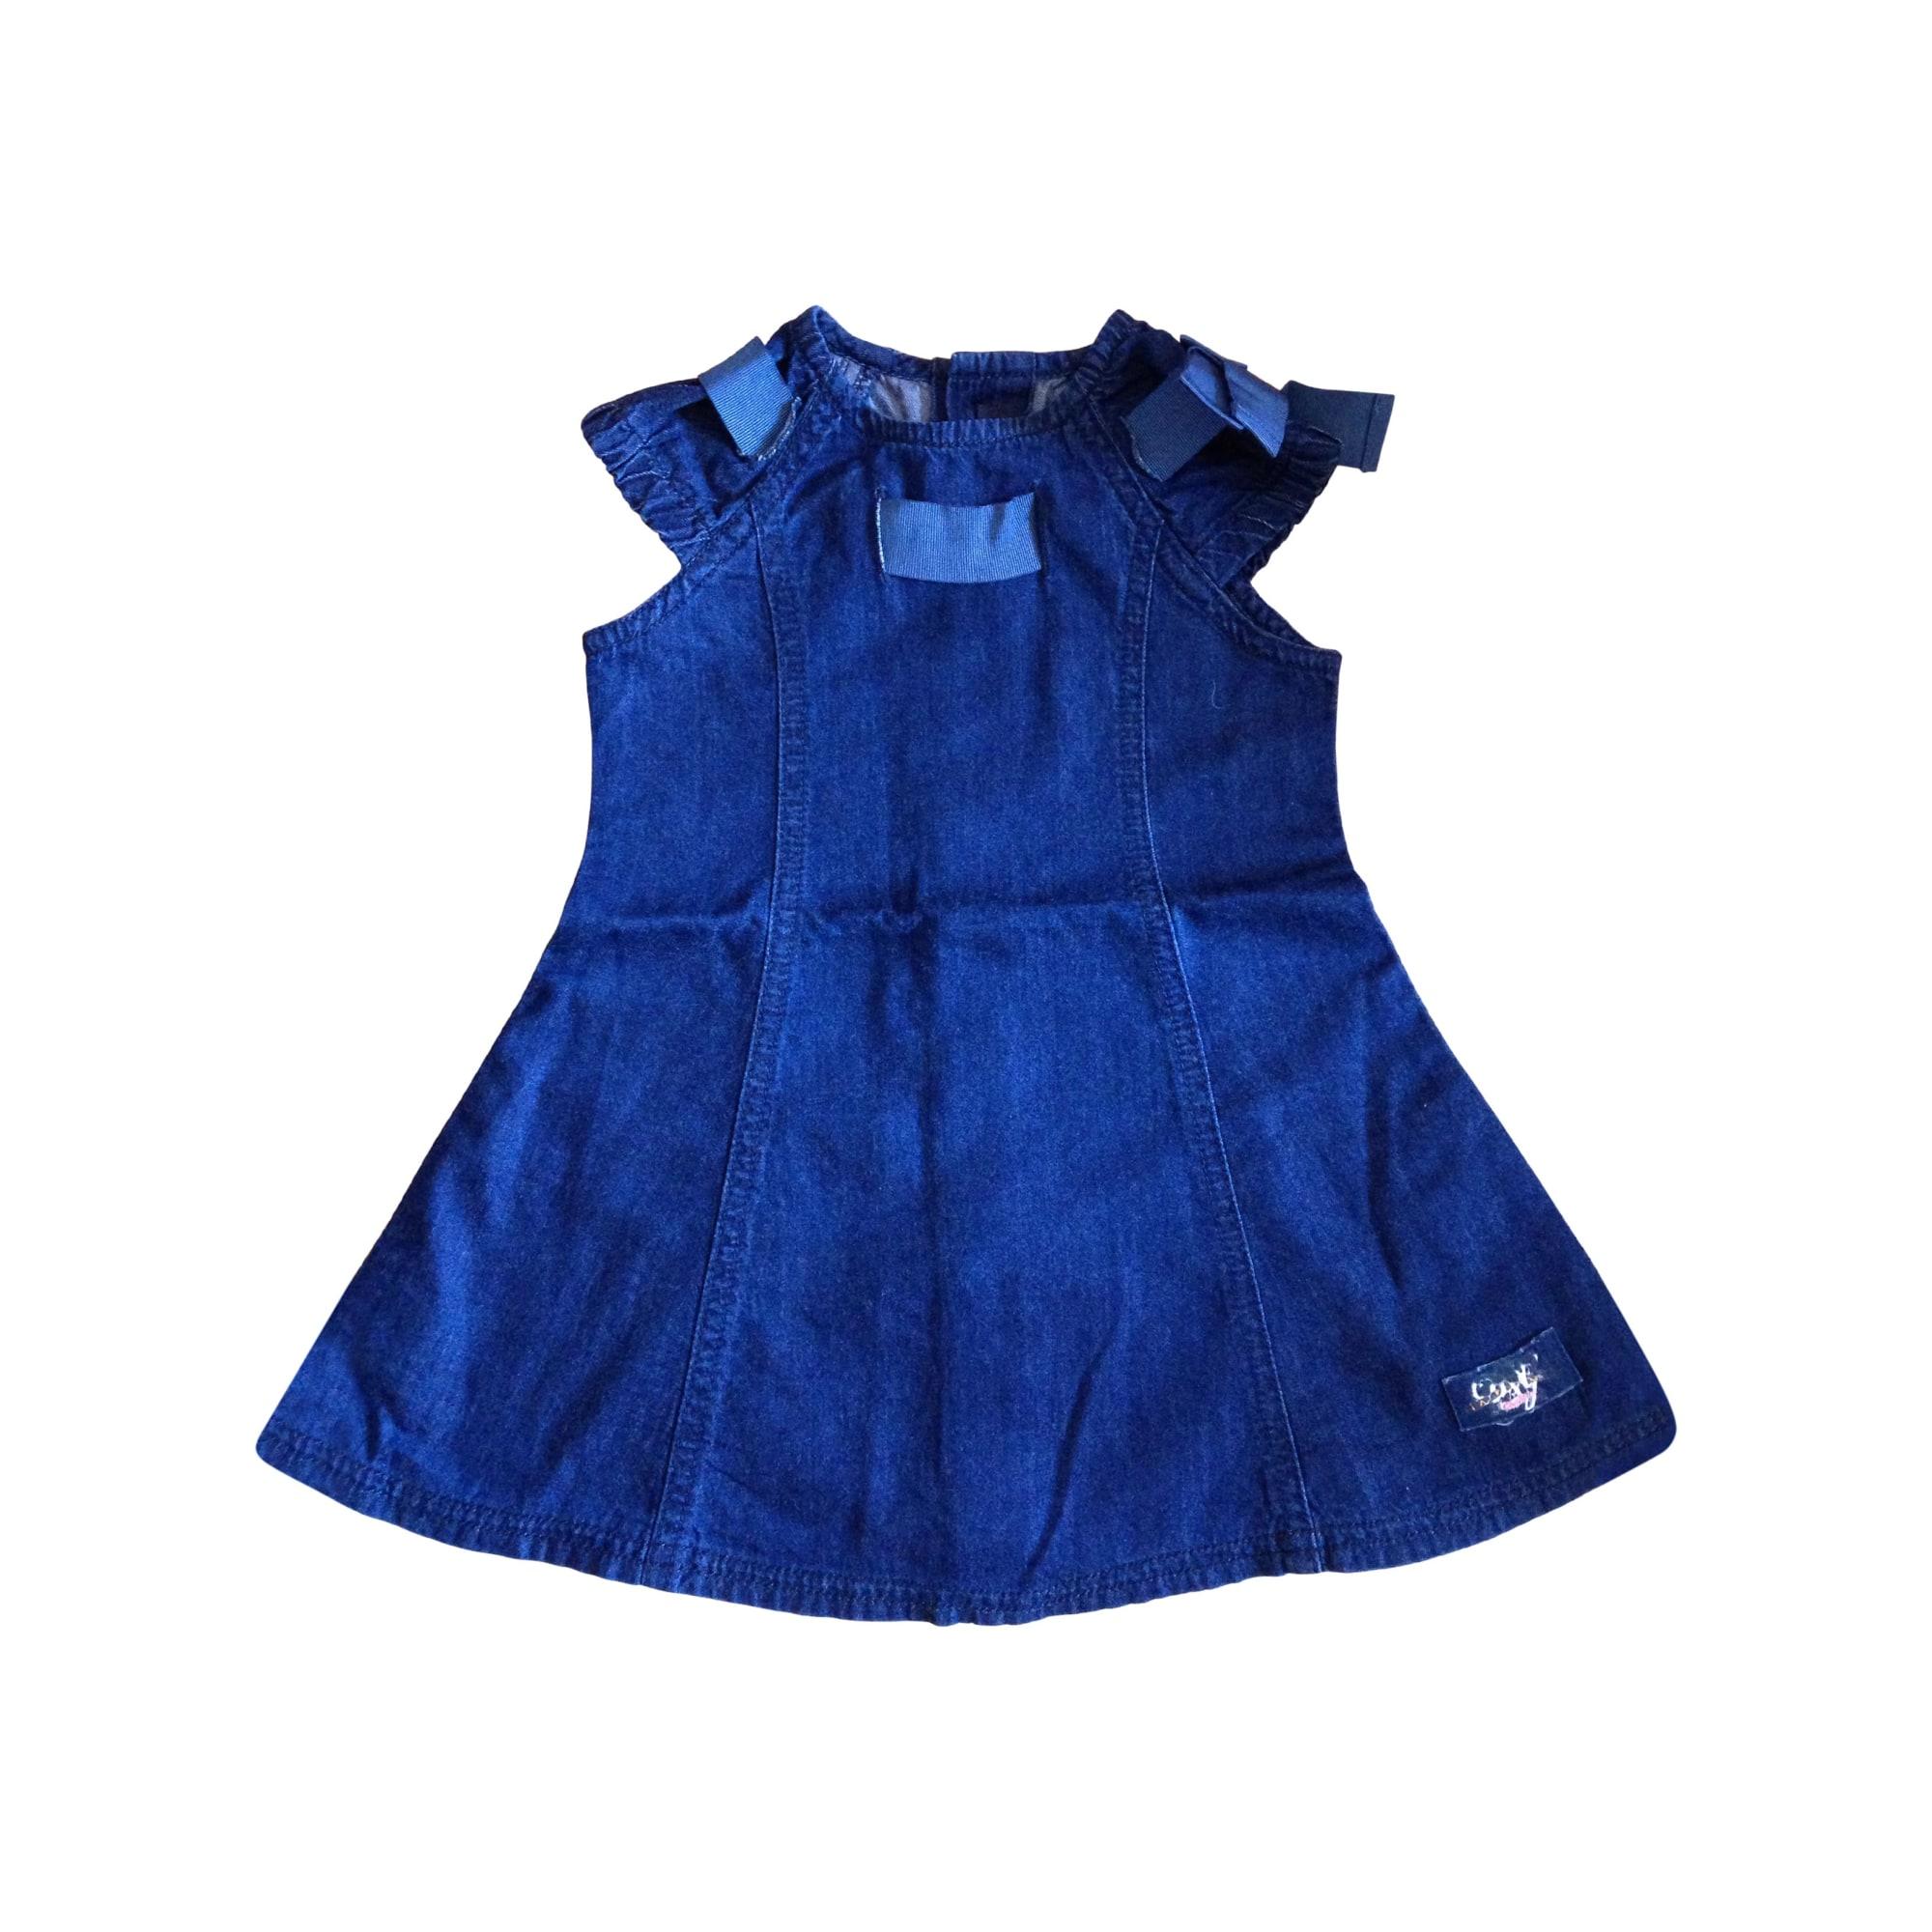 Robe DOLCE & GABBANA Bleu, bleu marine, bleu turquoise